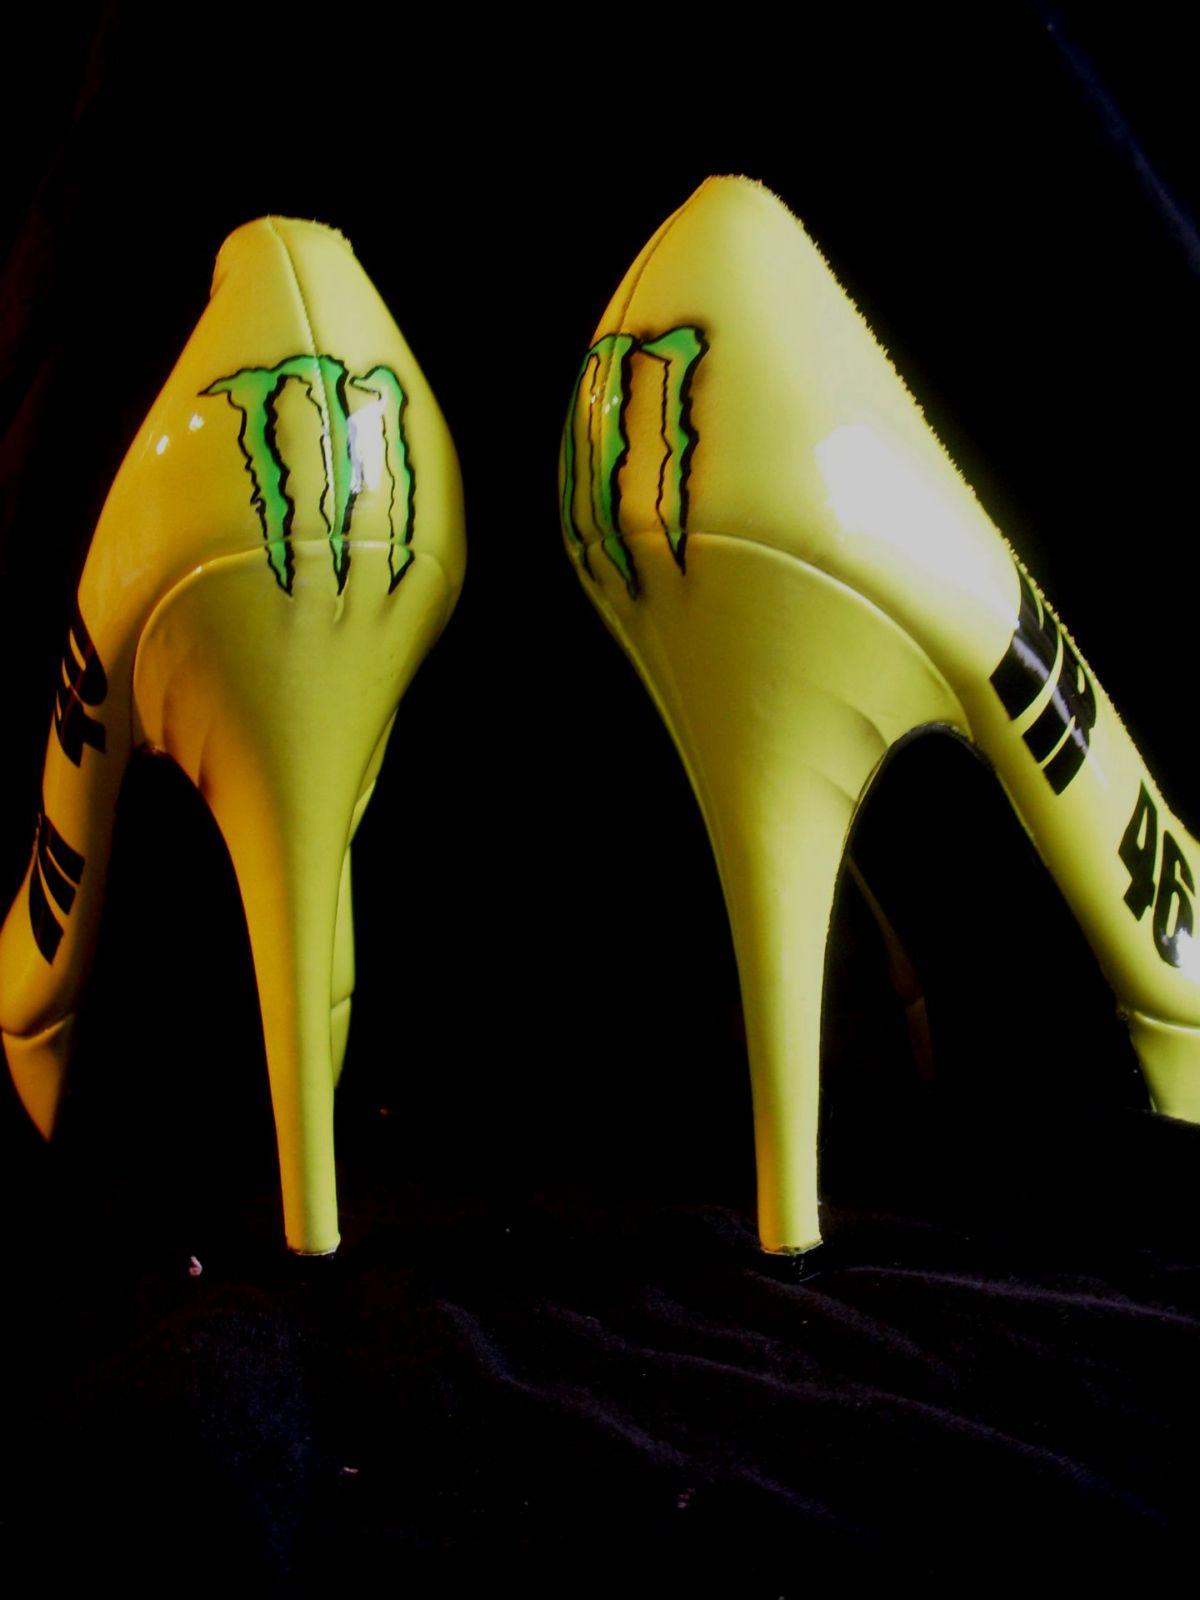 E Bike Reviews >> Bike-Branded High Heels Look Very Sexy - autoevolution